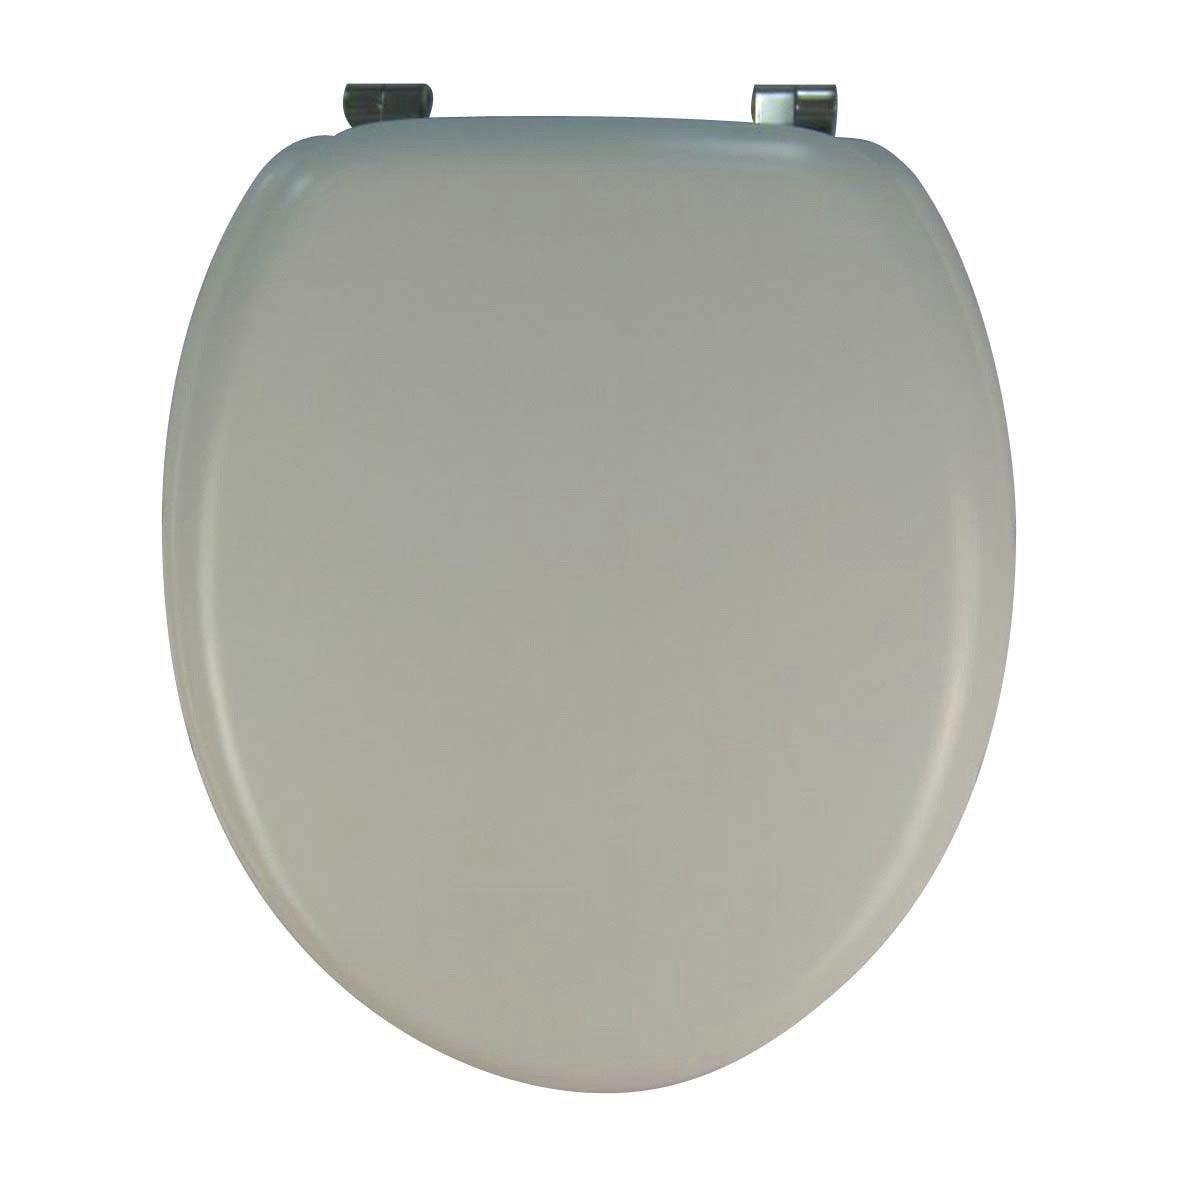 abattant wc sensea mateo blanc leroy merlin. Black Bedroom Furniture Sets. Home Design Ideas